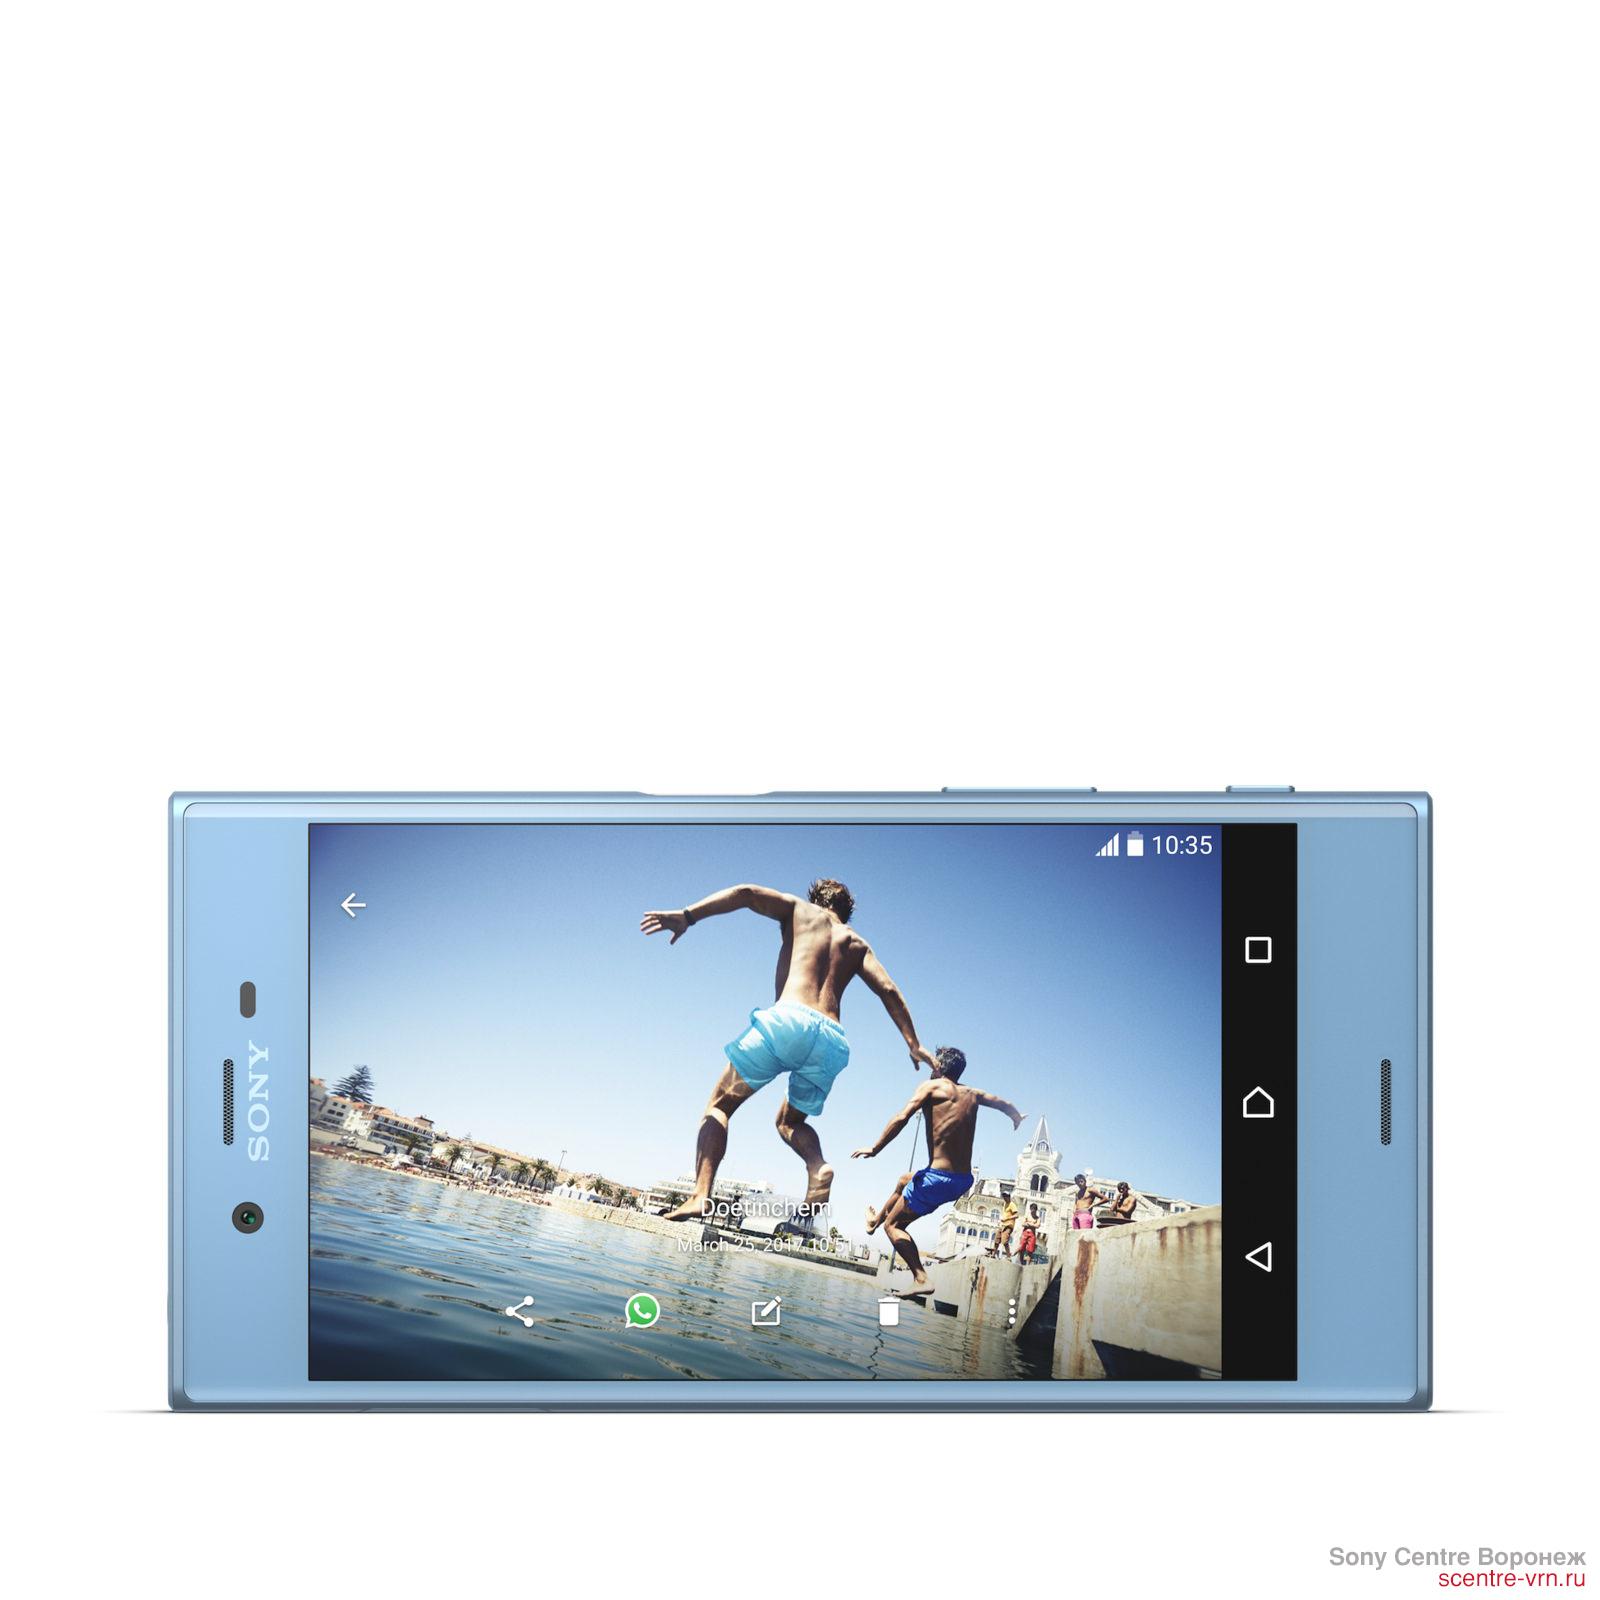 G8232/L смартфон Sony Xperia XZs dual, цвет Ледяной синий